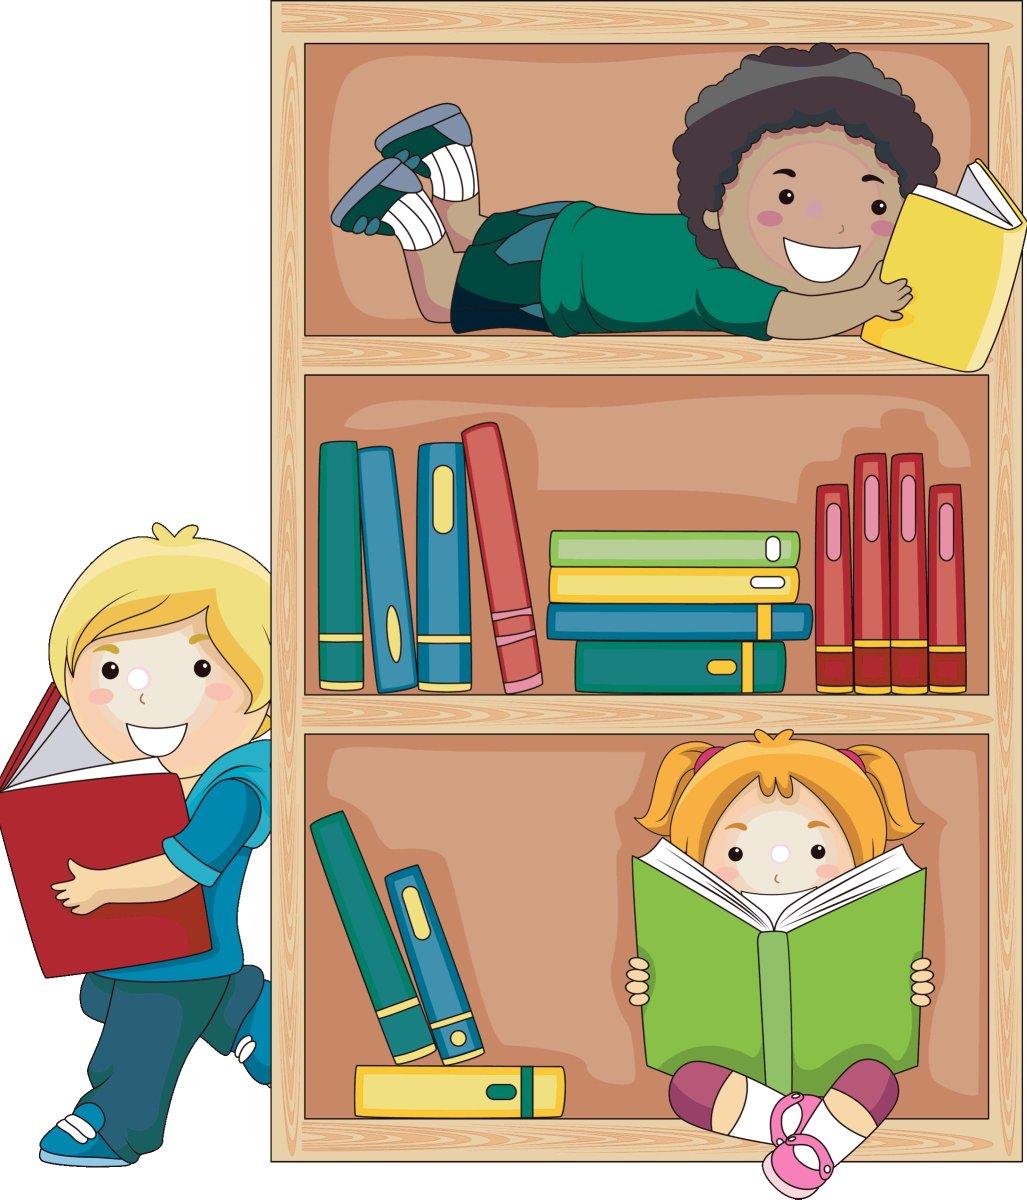 RT <a target='_blank' href='http://twitter.com/NottinghamPTA'>@NottinghamPTA</a>: Last Family Library Night tonight 8/21 (5:30-7:00pm)! <a target='_blank' href='http://search.twitter.com/search?q=KnightsRock'><a target='_blank' href='https://twitter.com/hashtag/KnightsRock?src=hash'>#KnightsRock</a></a> <a target='_blank' href='http://twitter.com/NTMKnightsAPS'>@NTMKnightsAPS</a> <a target='_blank' href='https://t.co/EKGFydd4gS'>https://t.co/EKGFydd4gS</a>